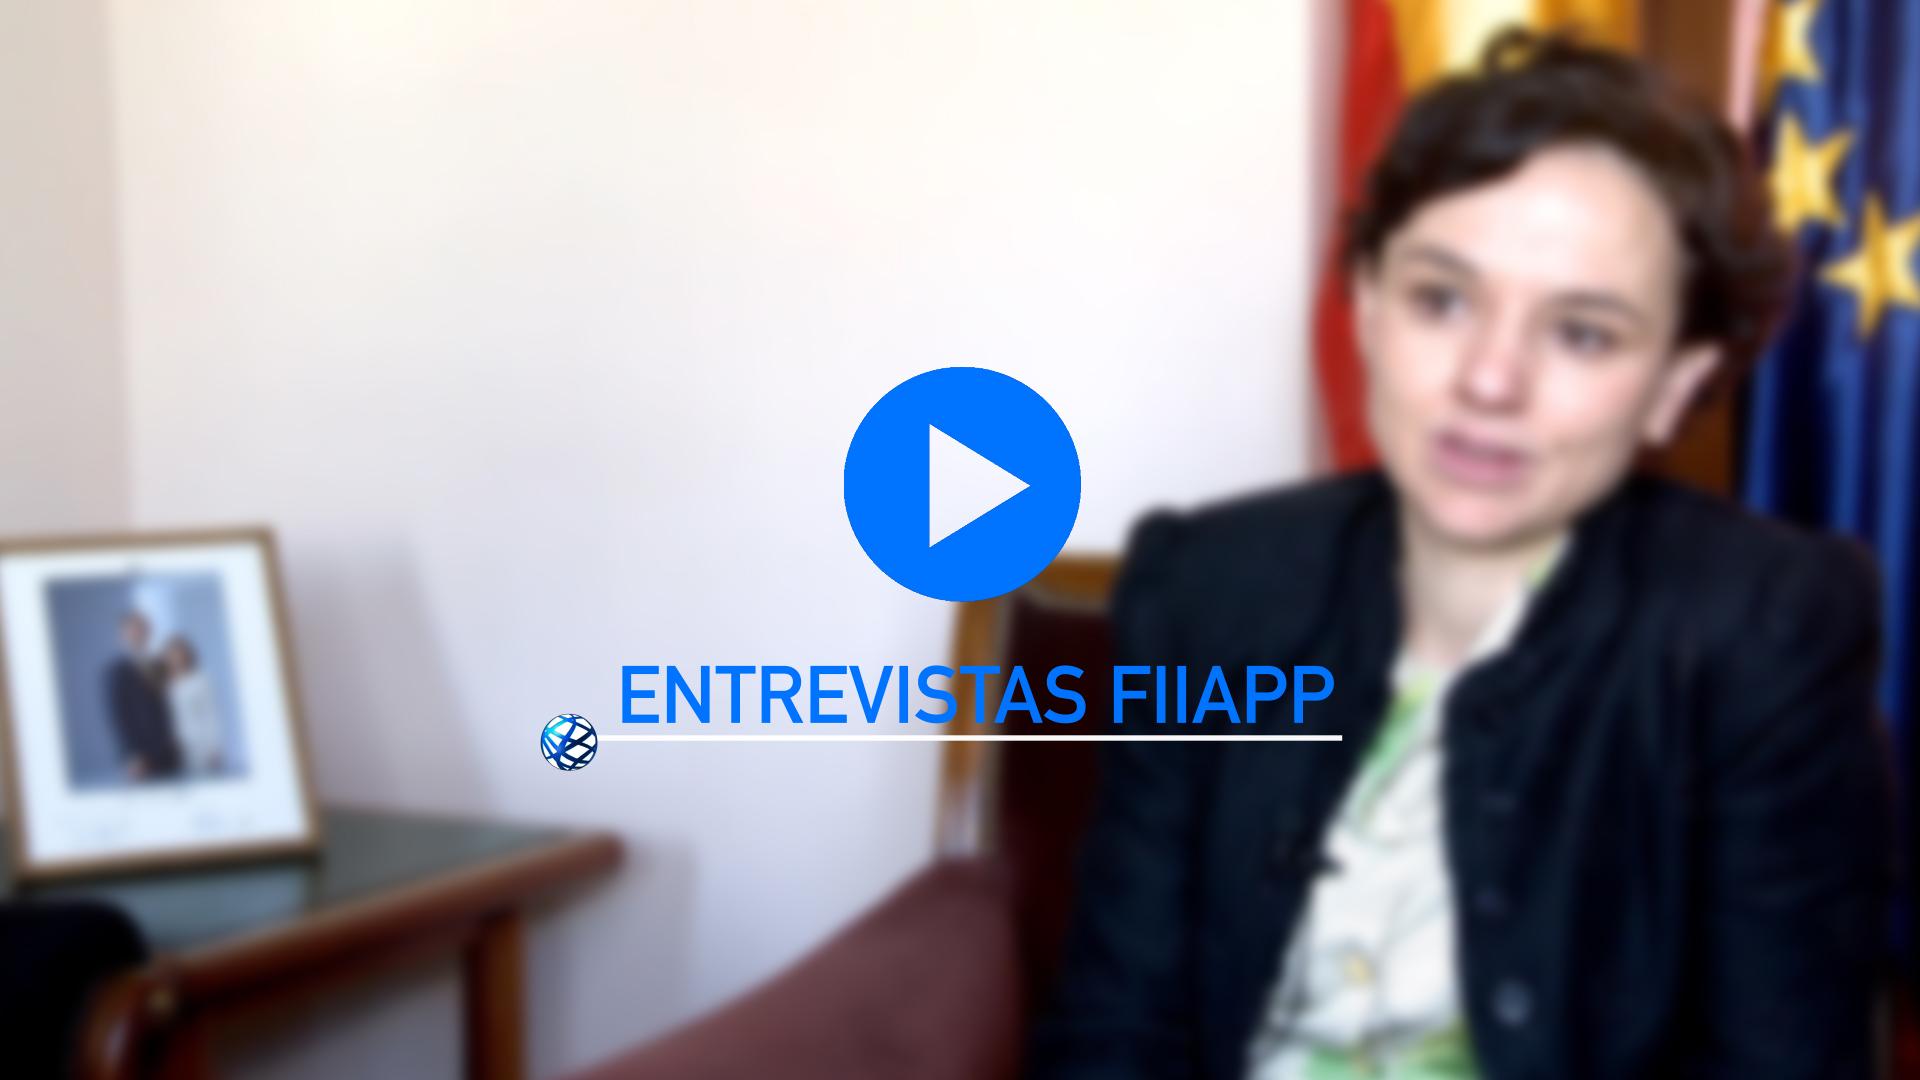 FIIAPP Interviews: María Pérez